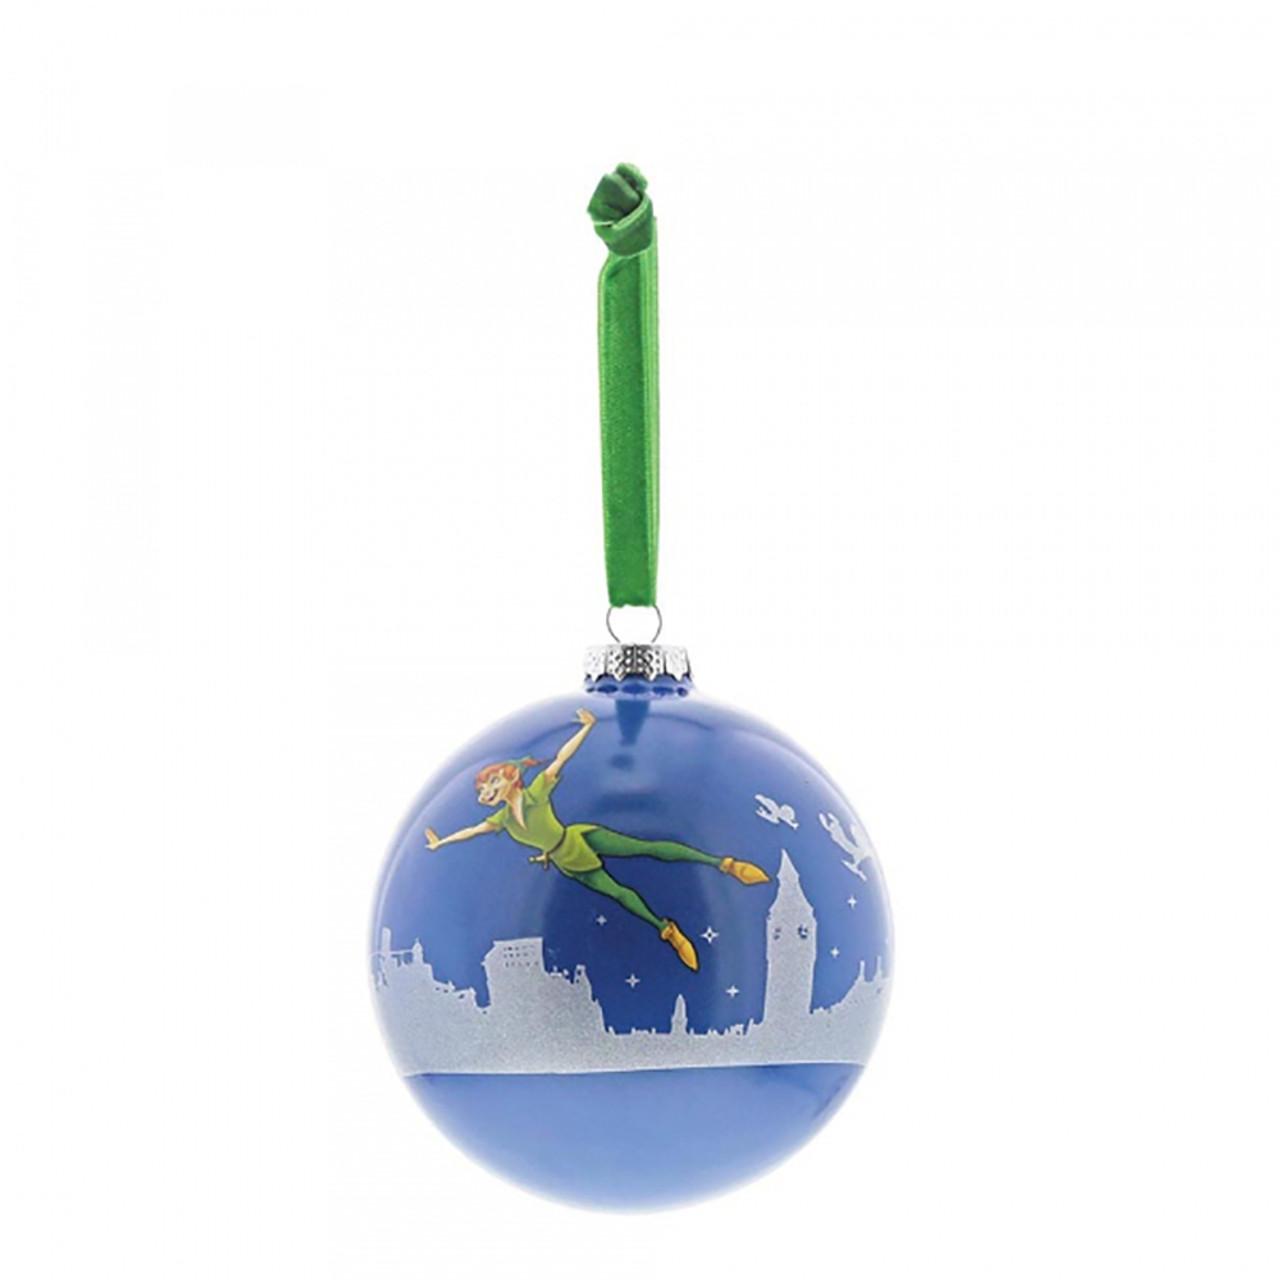 Hanging Christmas Ornaments Silhouette.Disney Peter Pan Hanging Bauble 10cm